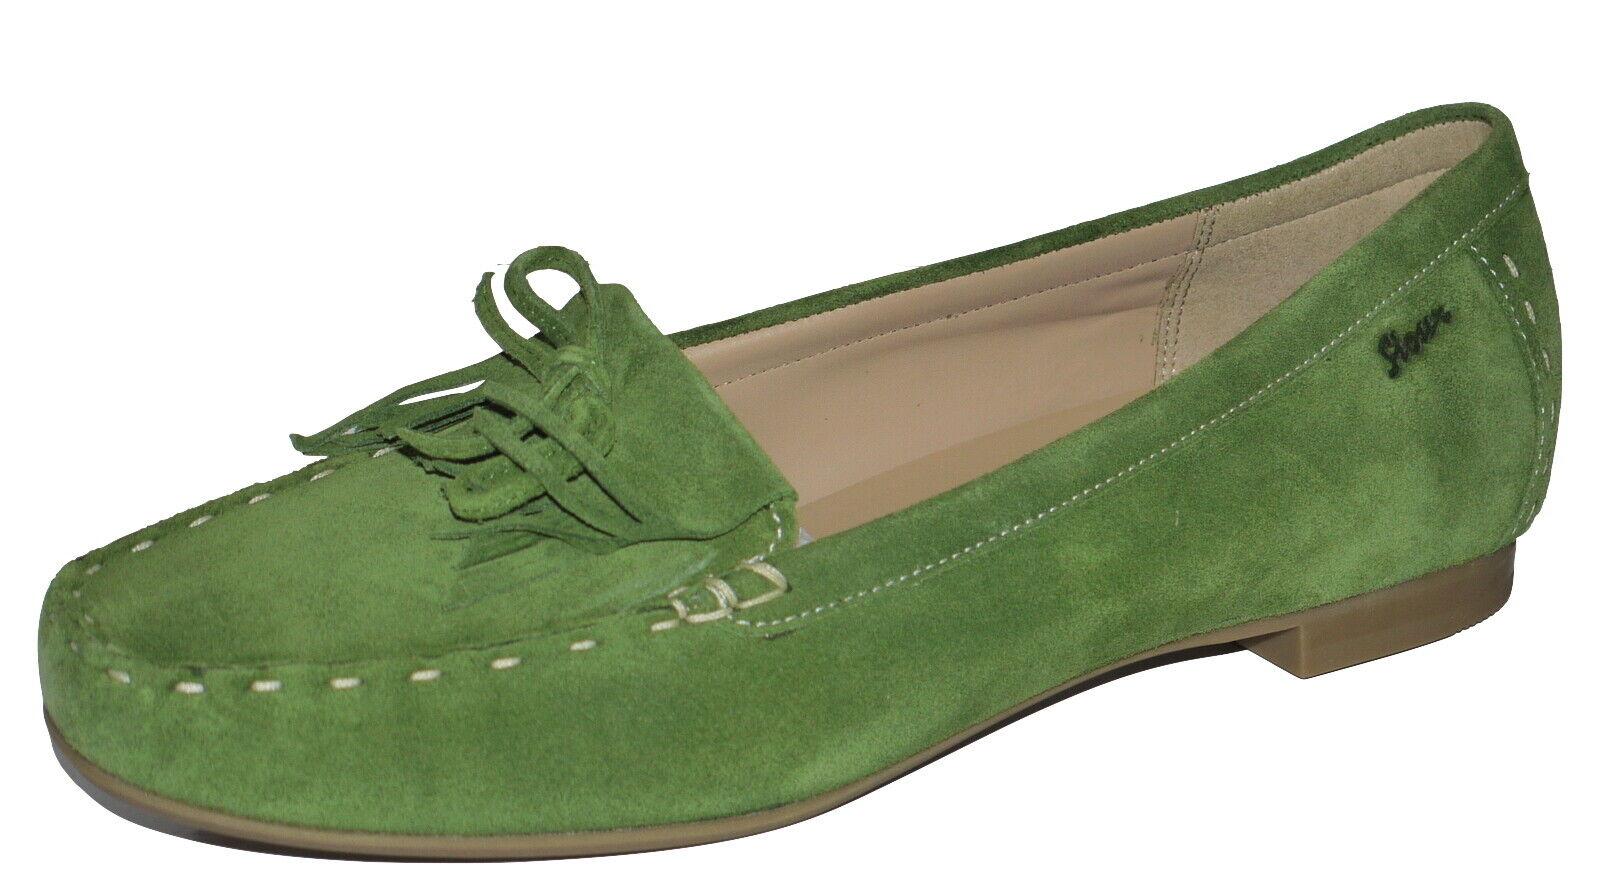 Sioux zibja vert Gazon chaussures en daim